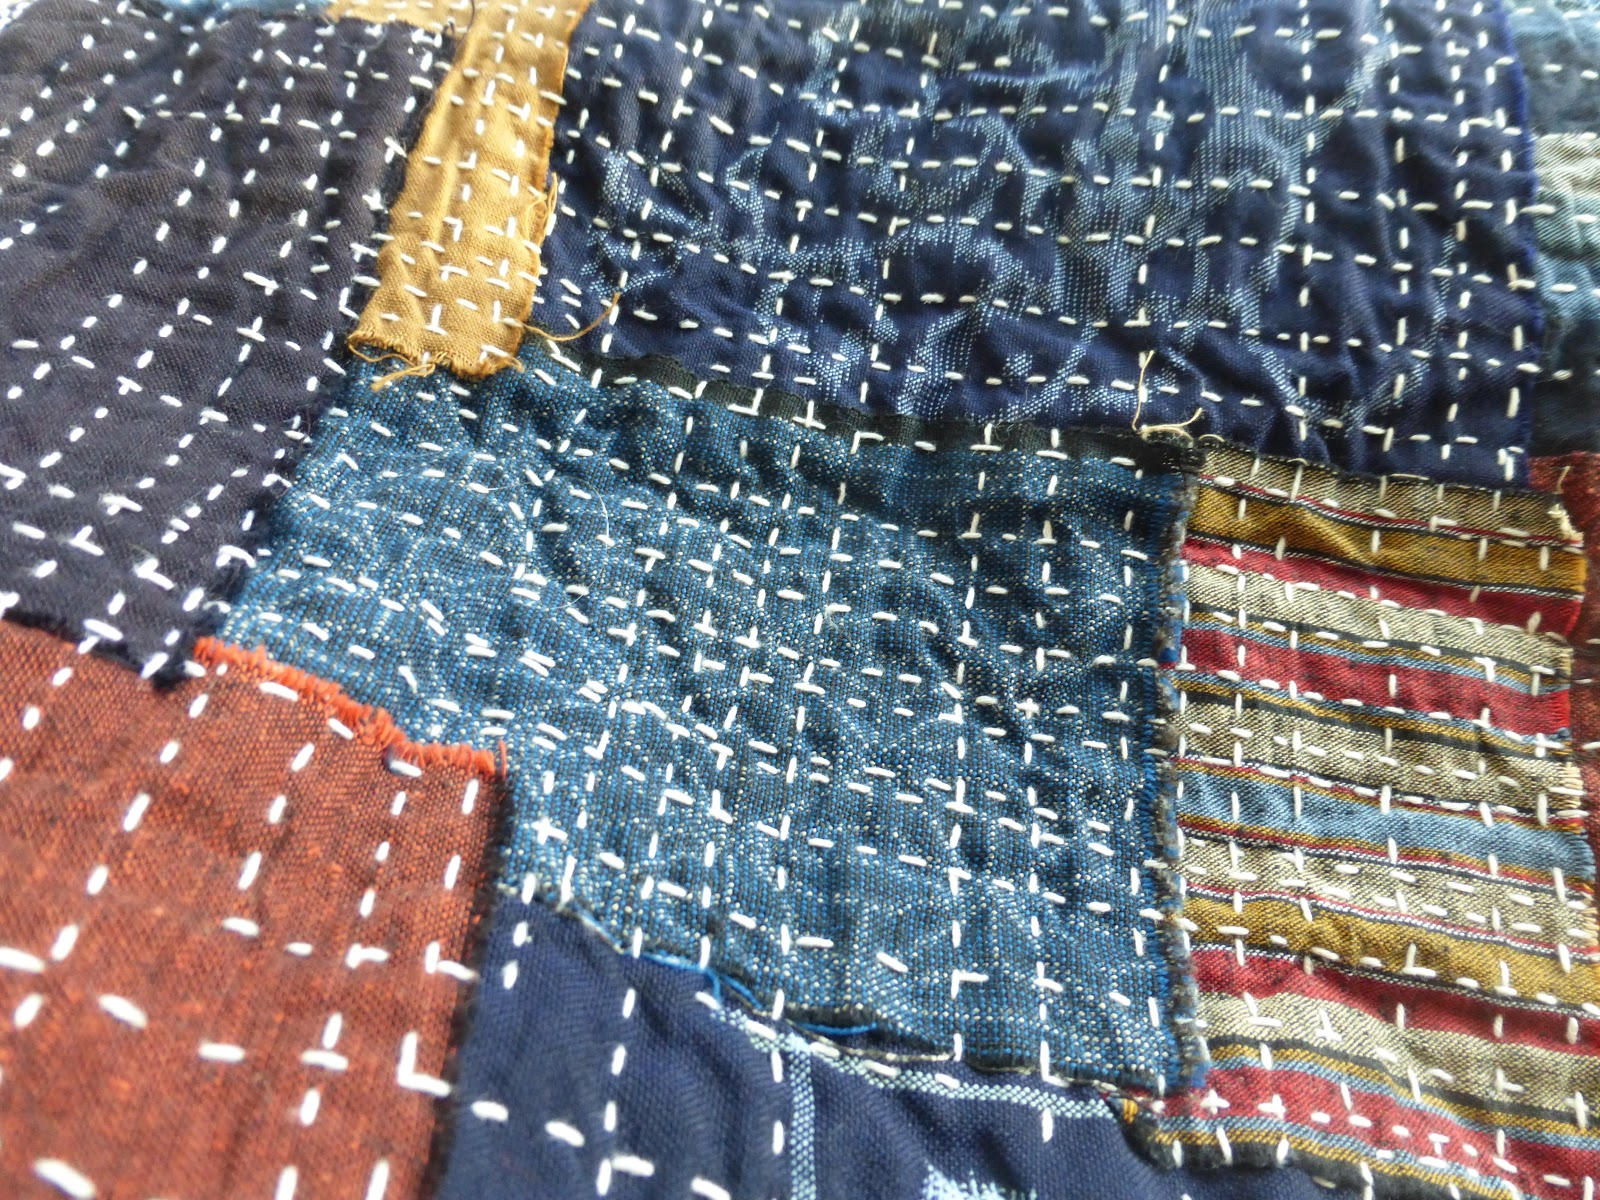 Sashiko And Other Stitching